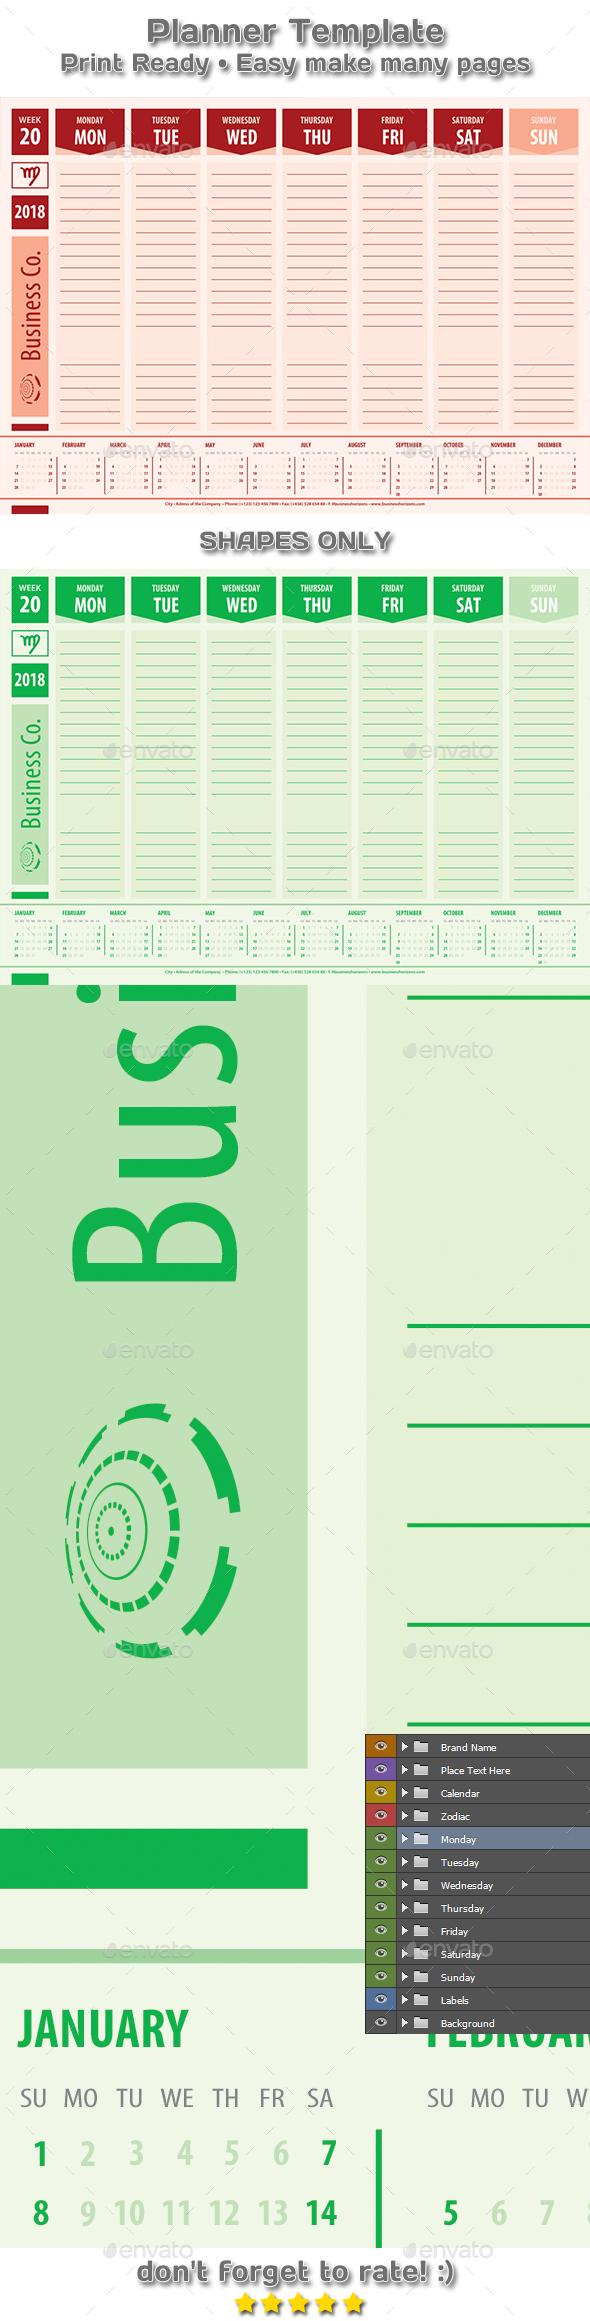 Modern Planner Calendar 2018 Business Style Template - Calendars Stationery